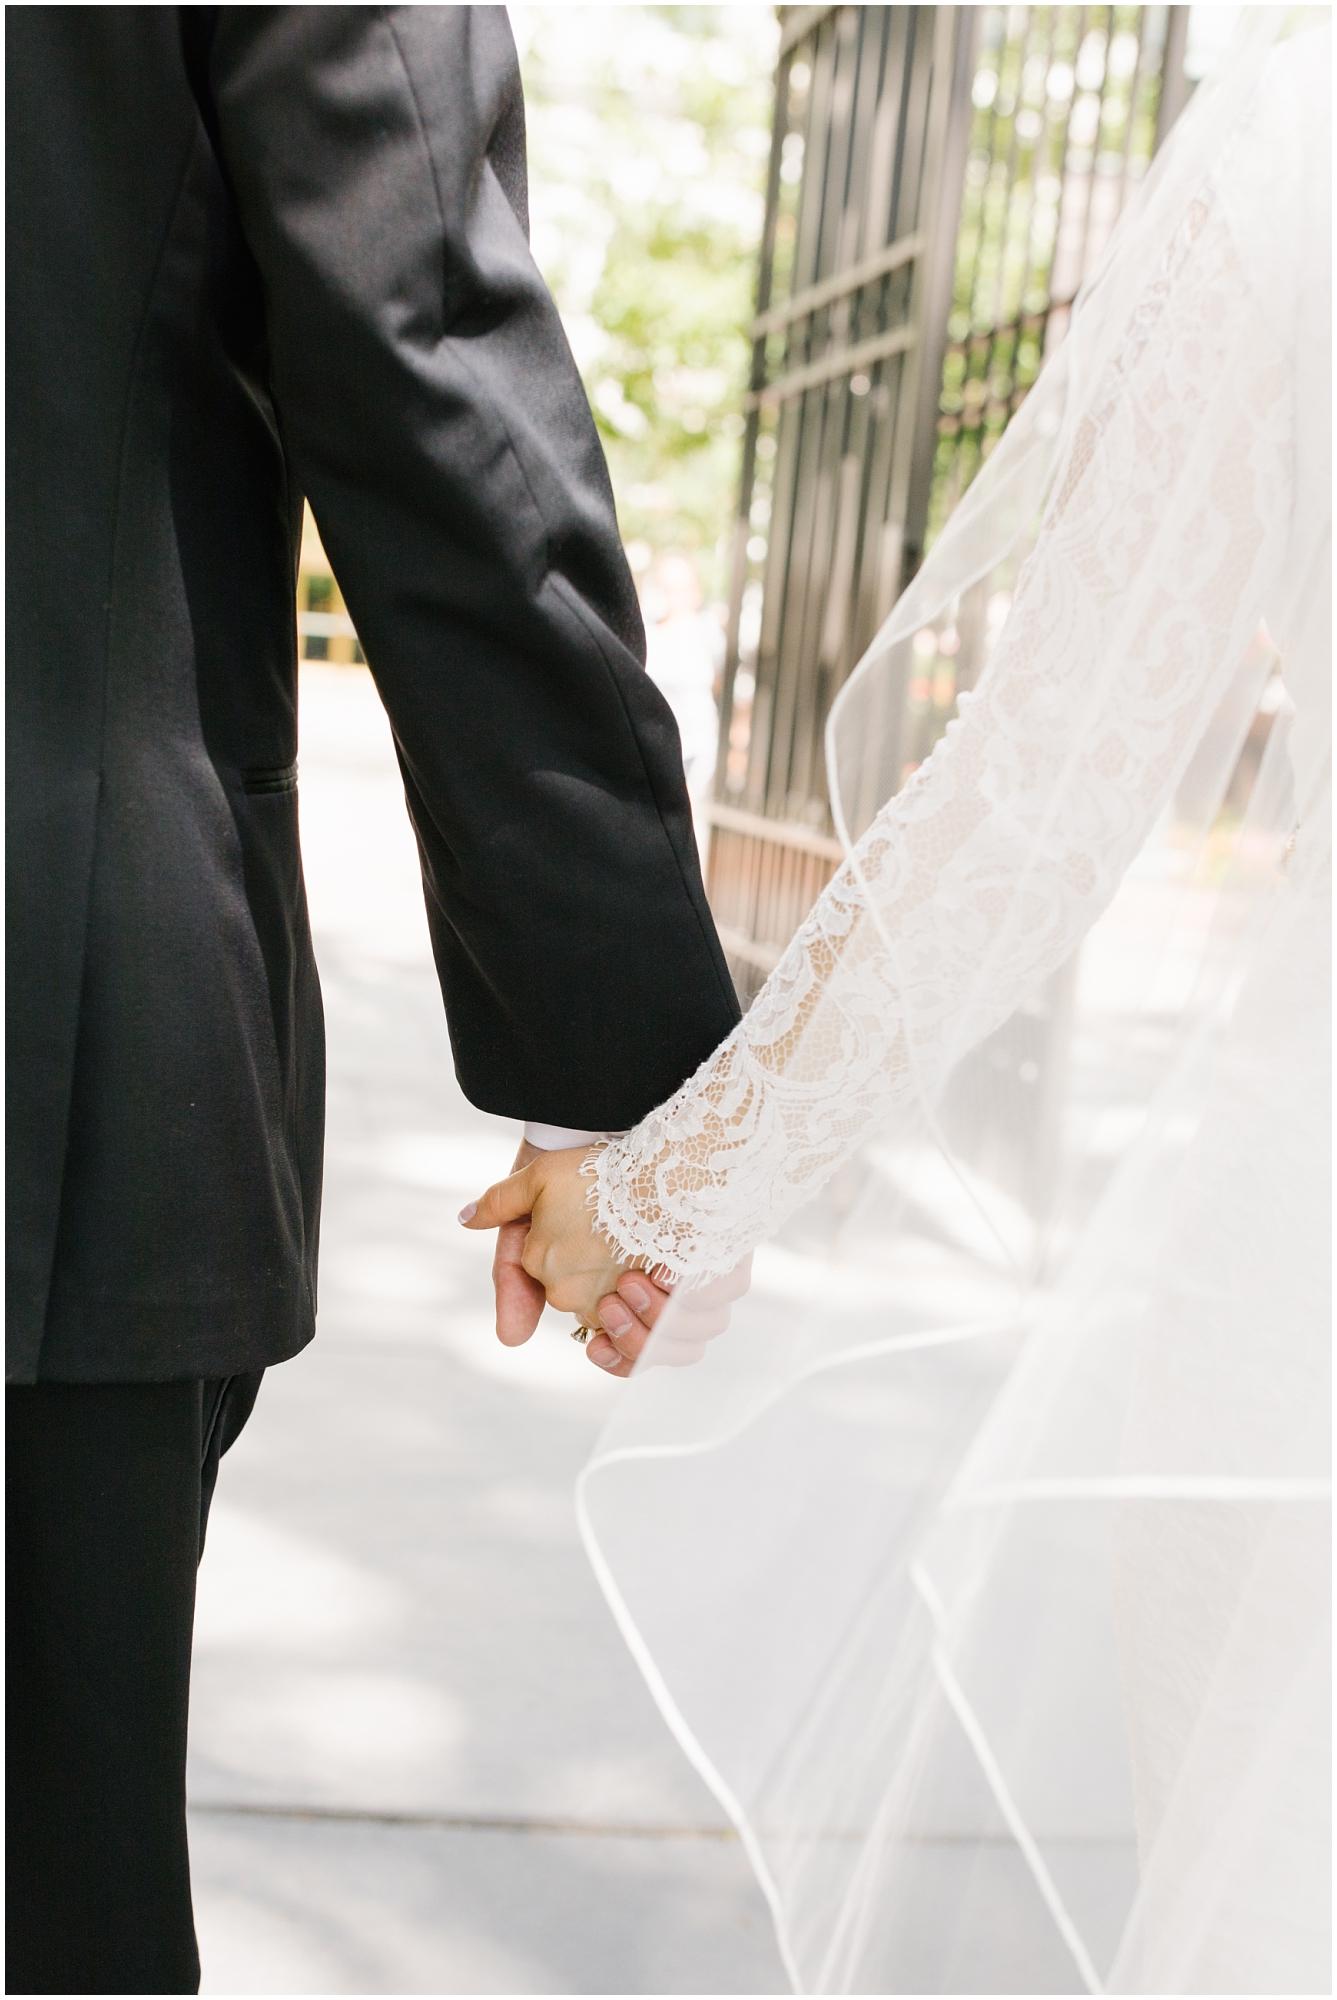 CherylandTyler-215_Lizzie-B-Imagery-Utah-Wedding-Photographer-Park-City-Salt-Lake-City-Temple-Wells-Fargo-Building.jpg